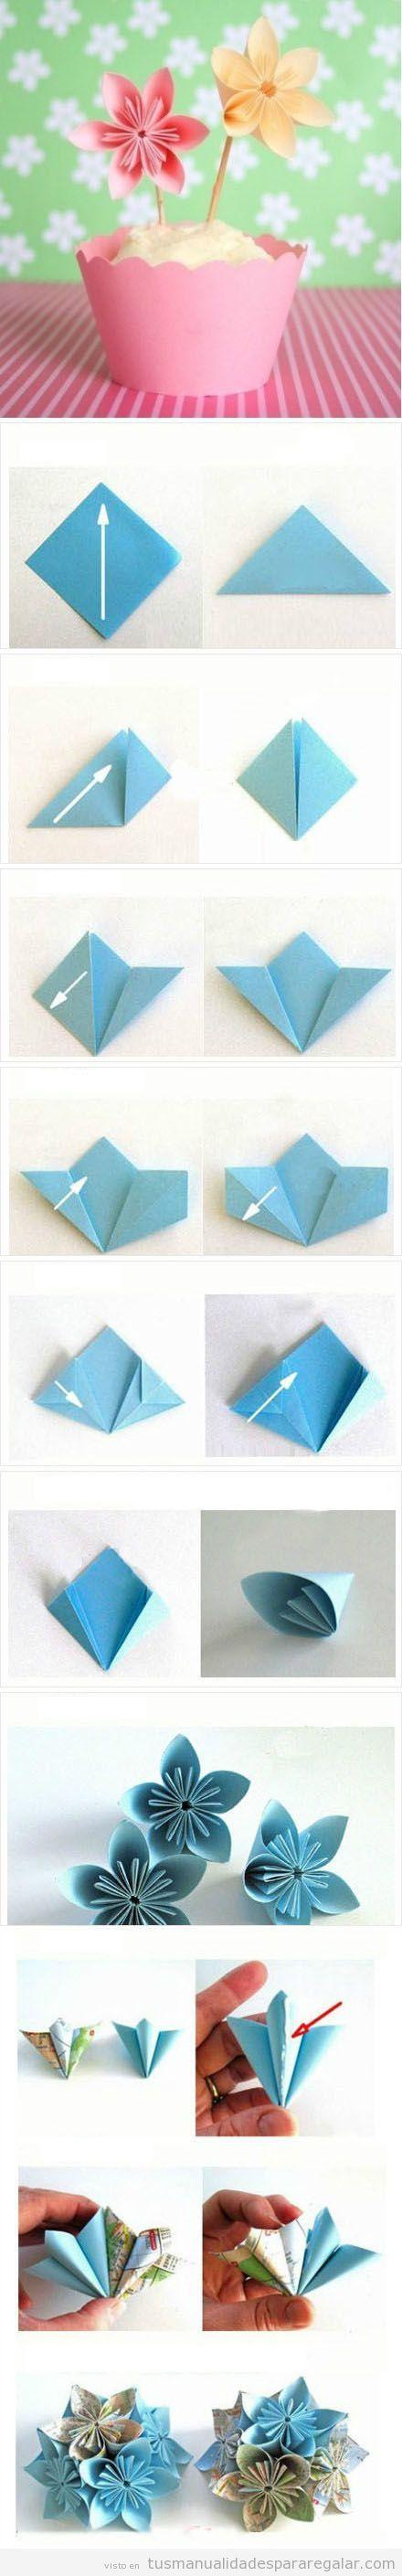 Tutorial origami forma flo, manualidades regalar